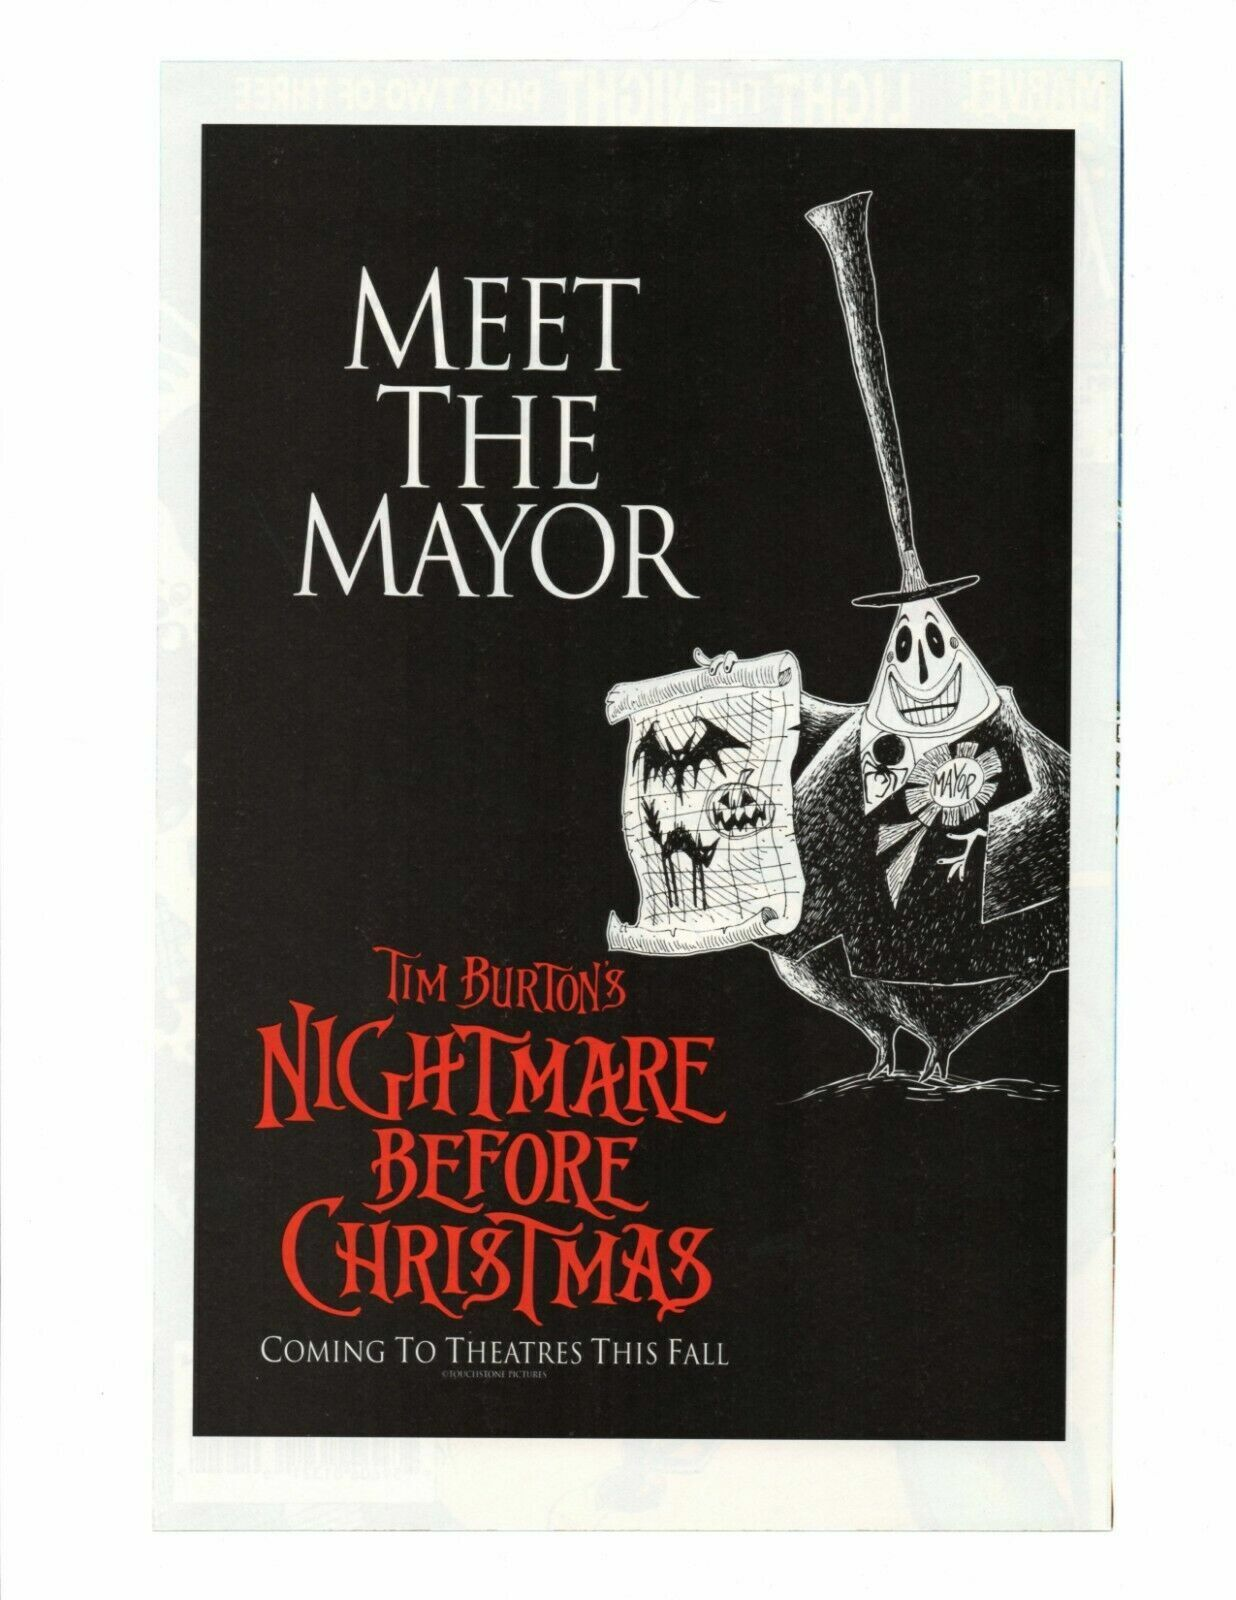 RARE Vintage 1993 The Nightmare Before Christmas Meet The Mayor Promo Movie AD